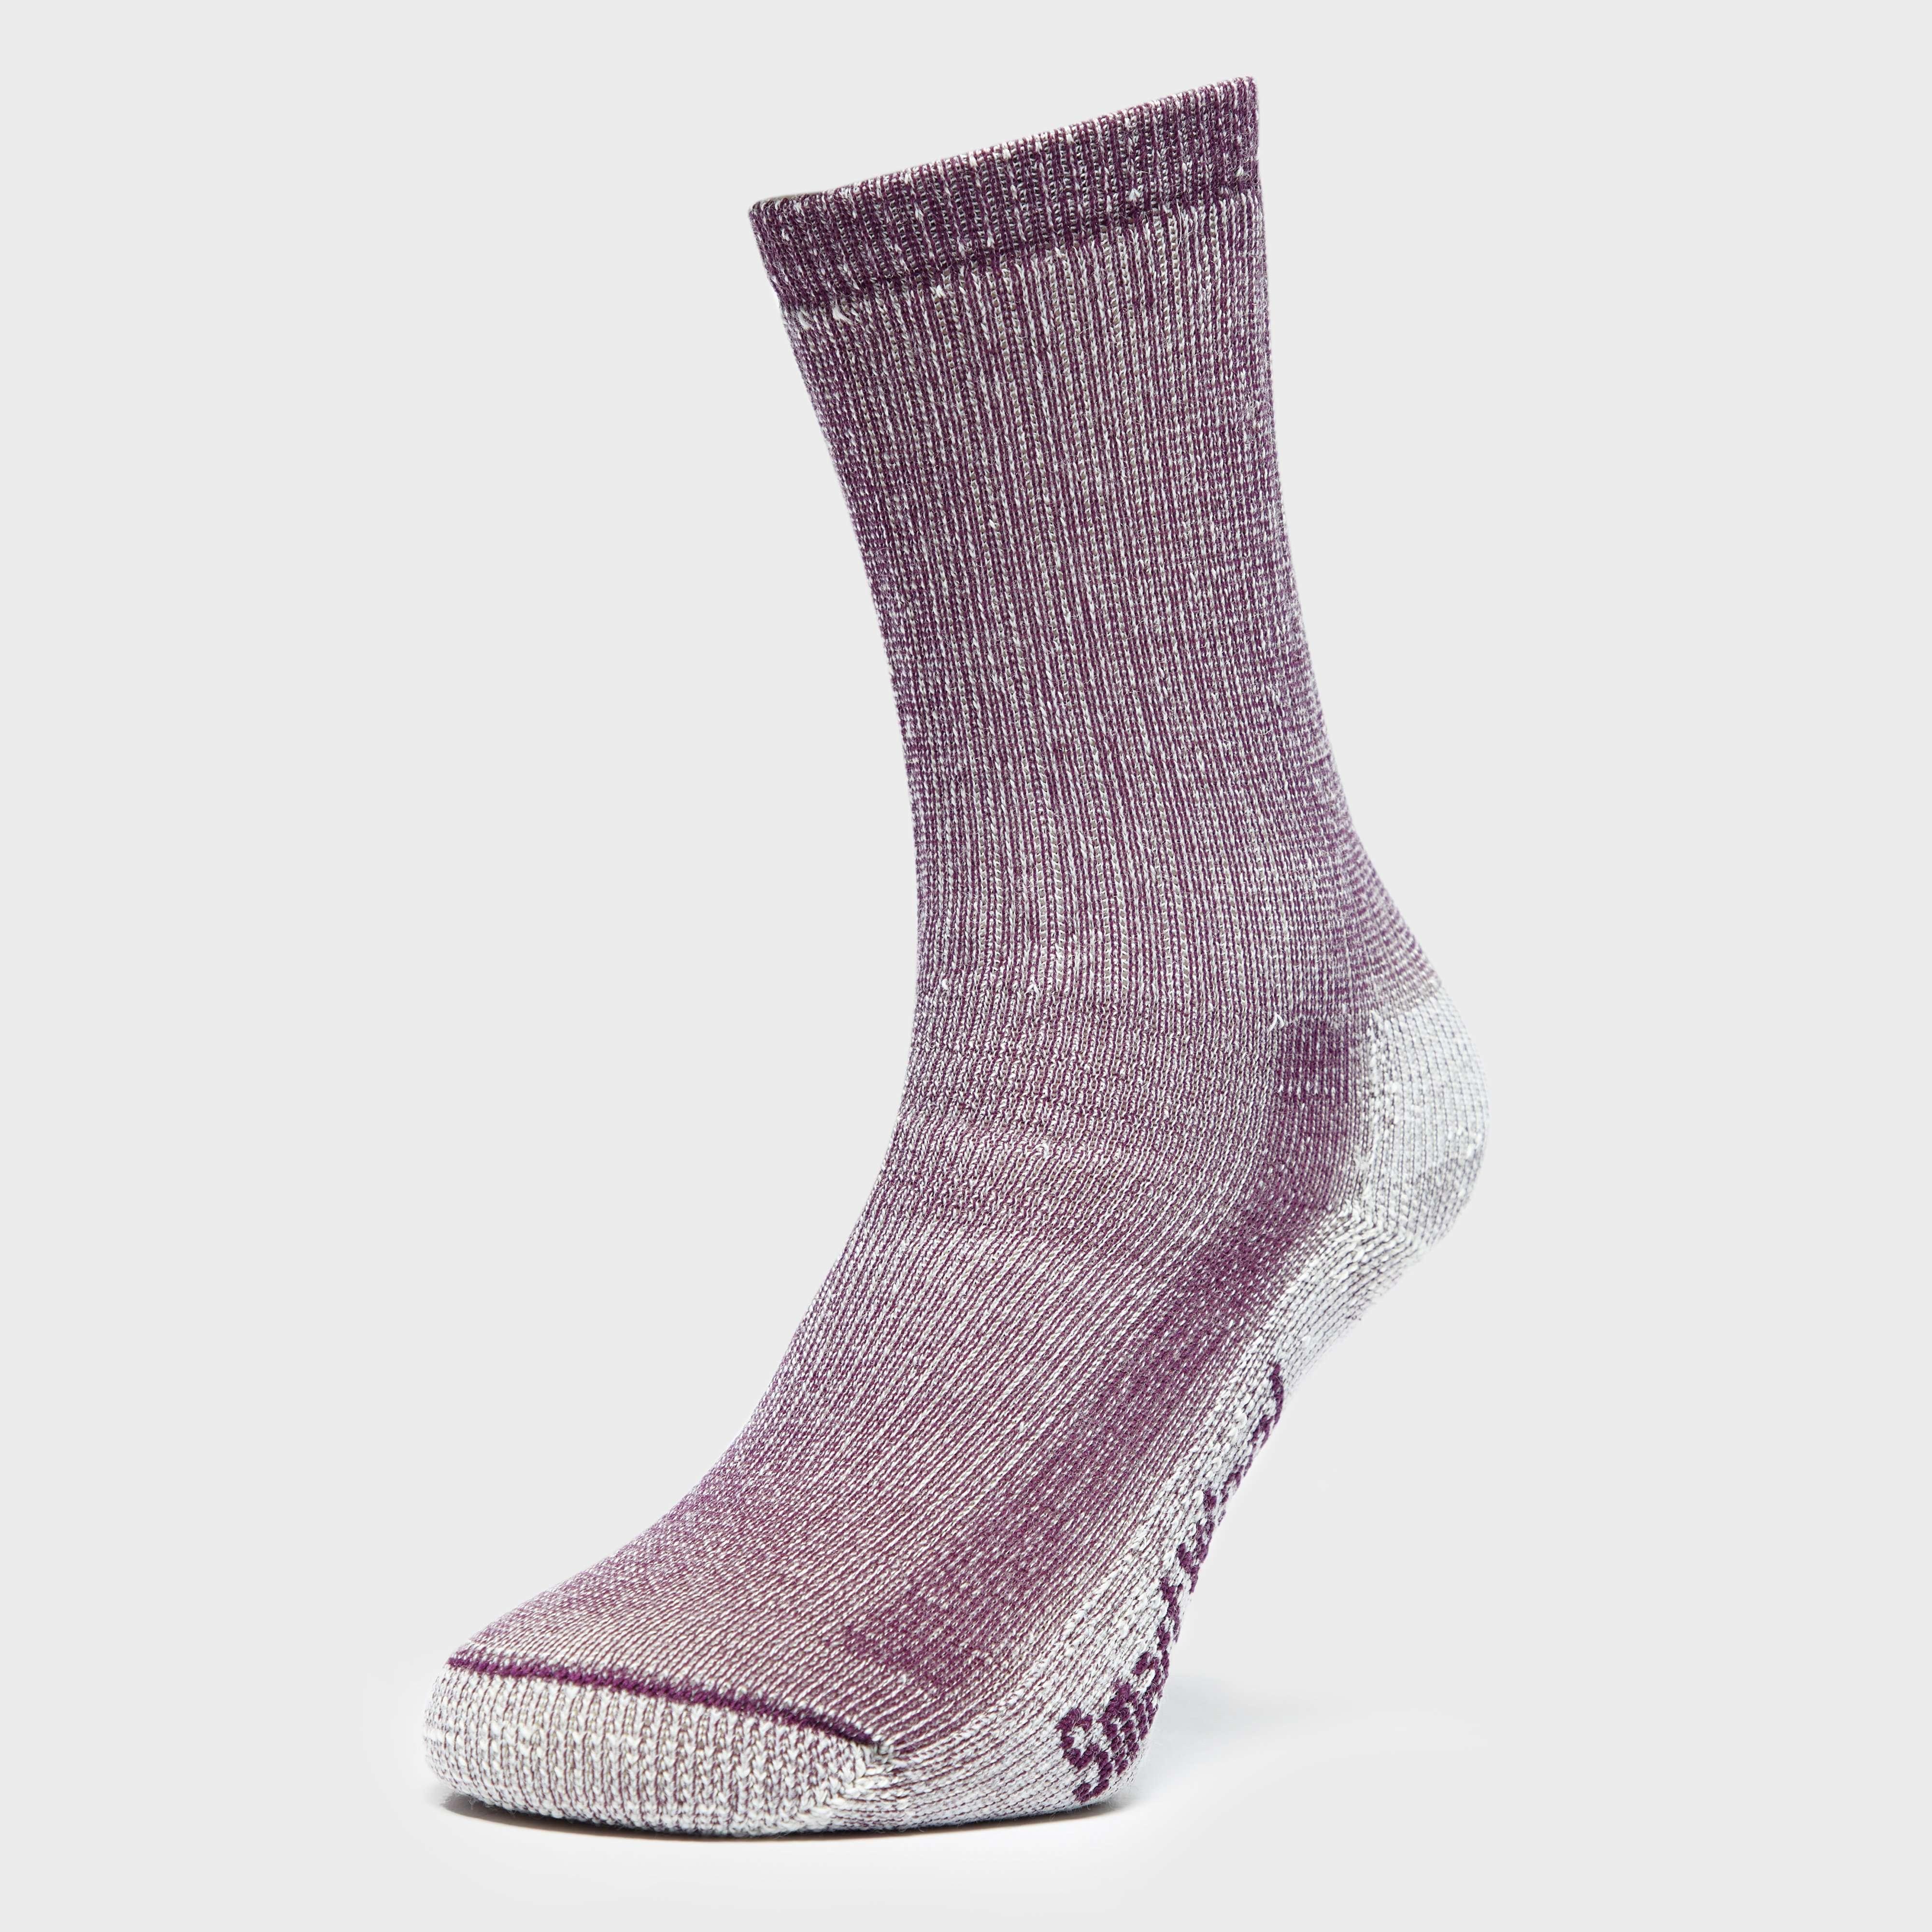 SMARTWOOL Women's Hiking Medium Crew Socks